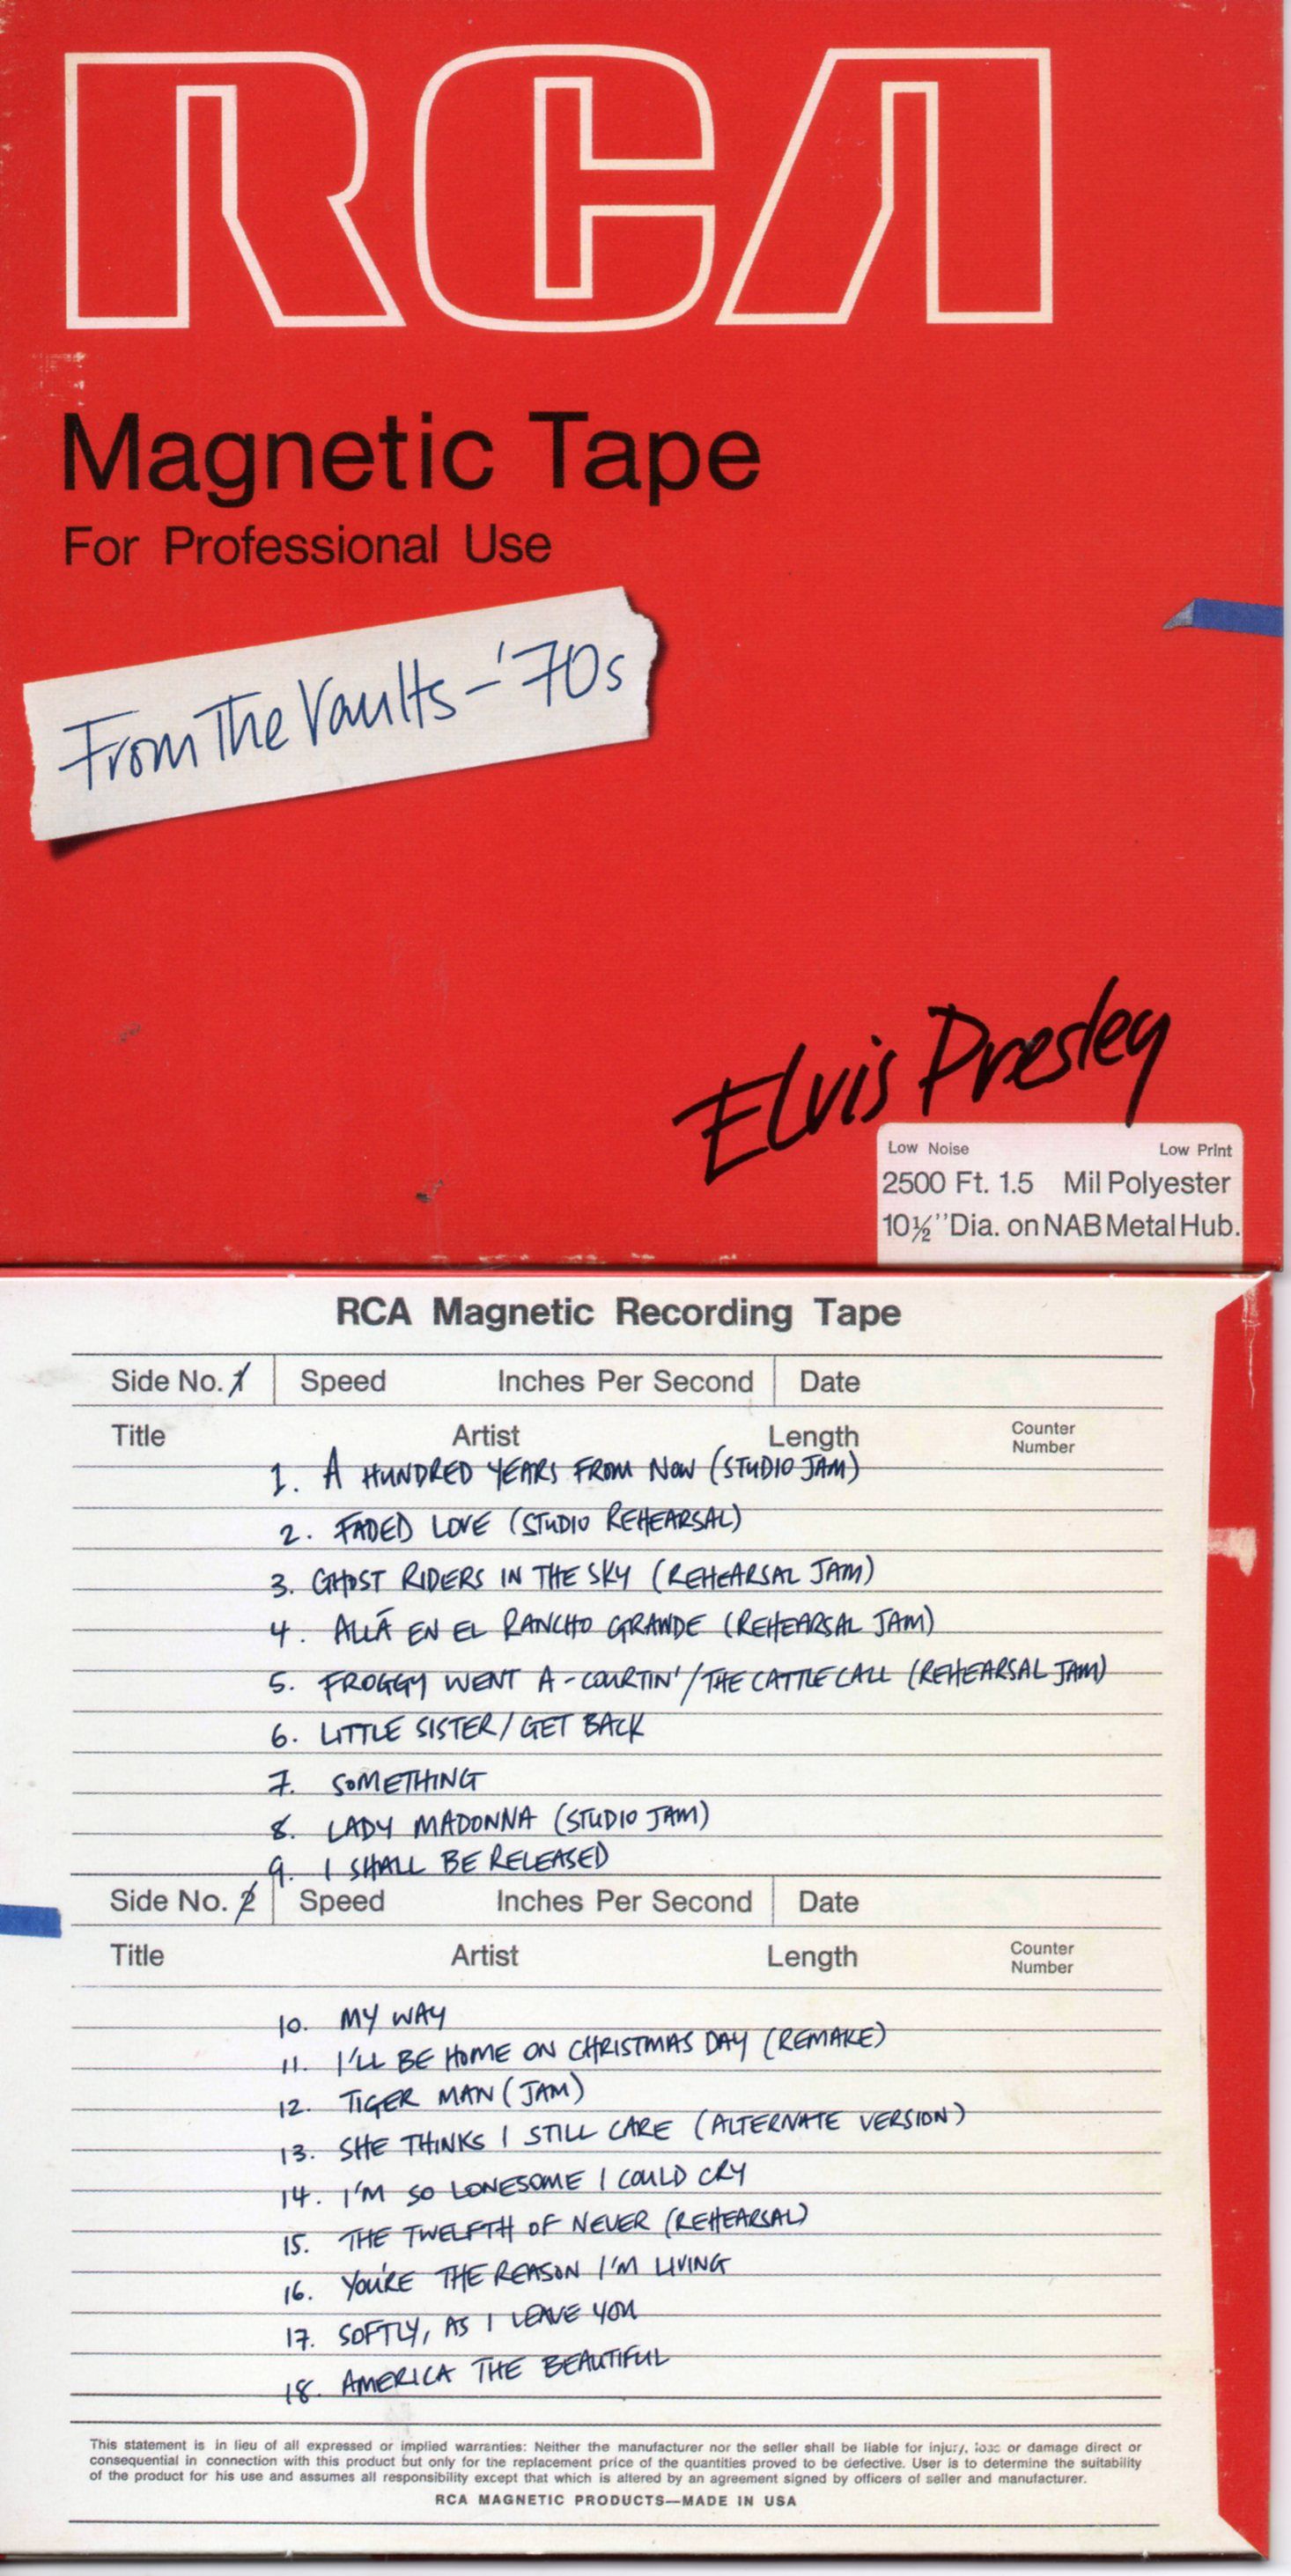 Elvis PRESLEY - From The Vaults '70s - Cardboard Sleeve - 18-track Rare Tracks